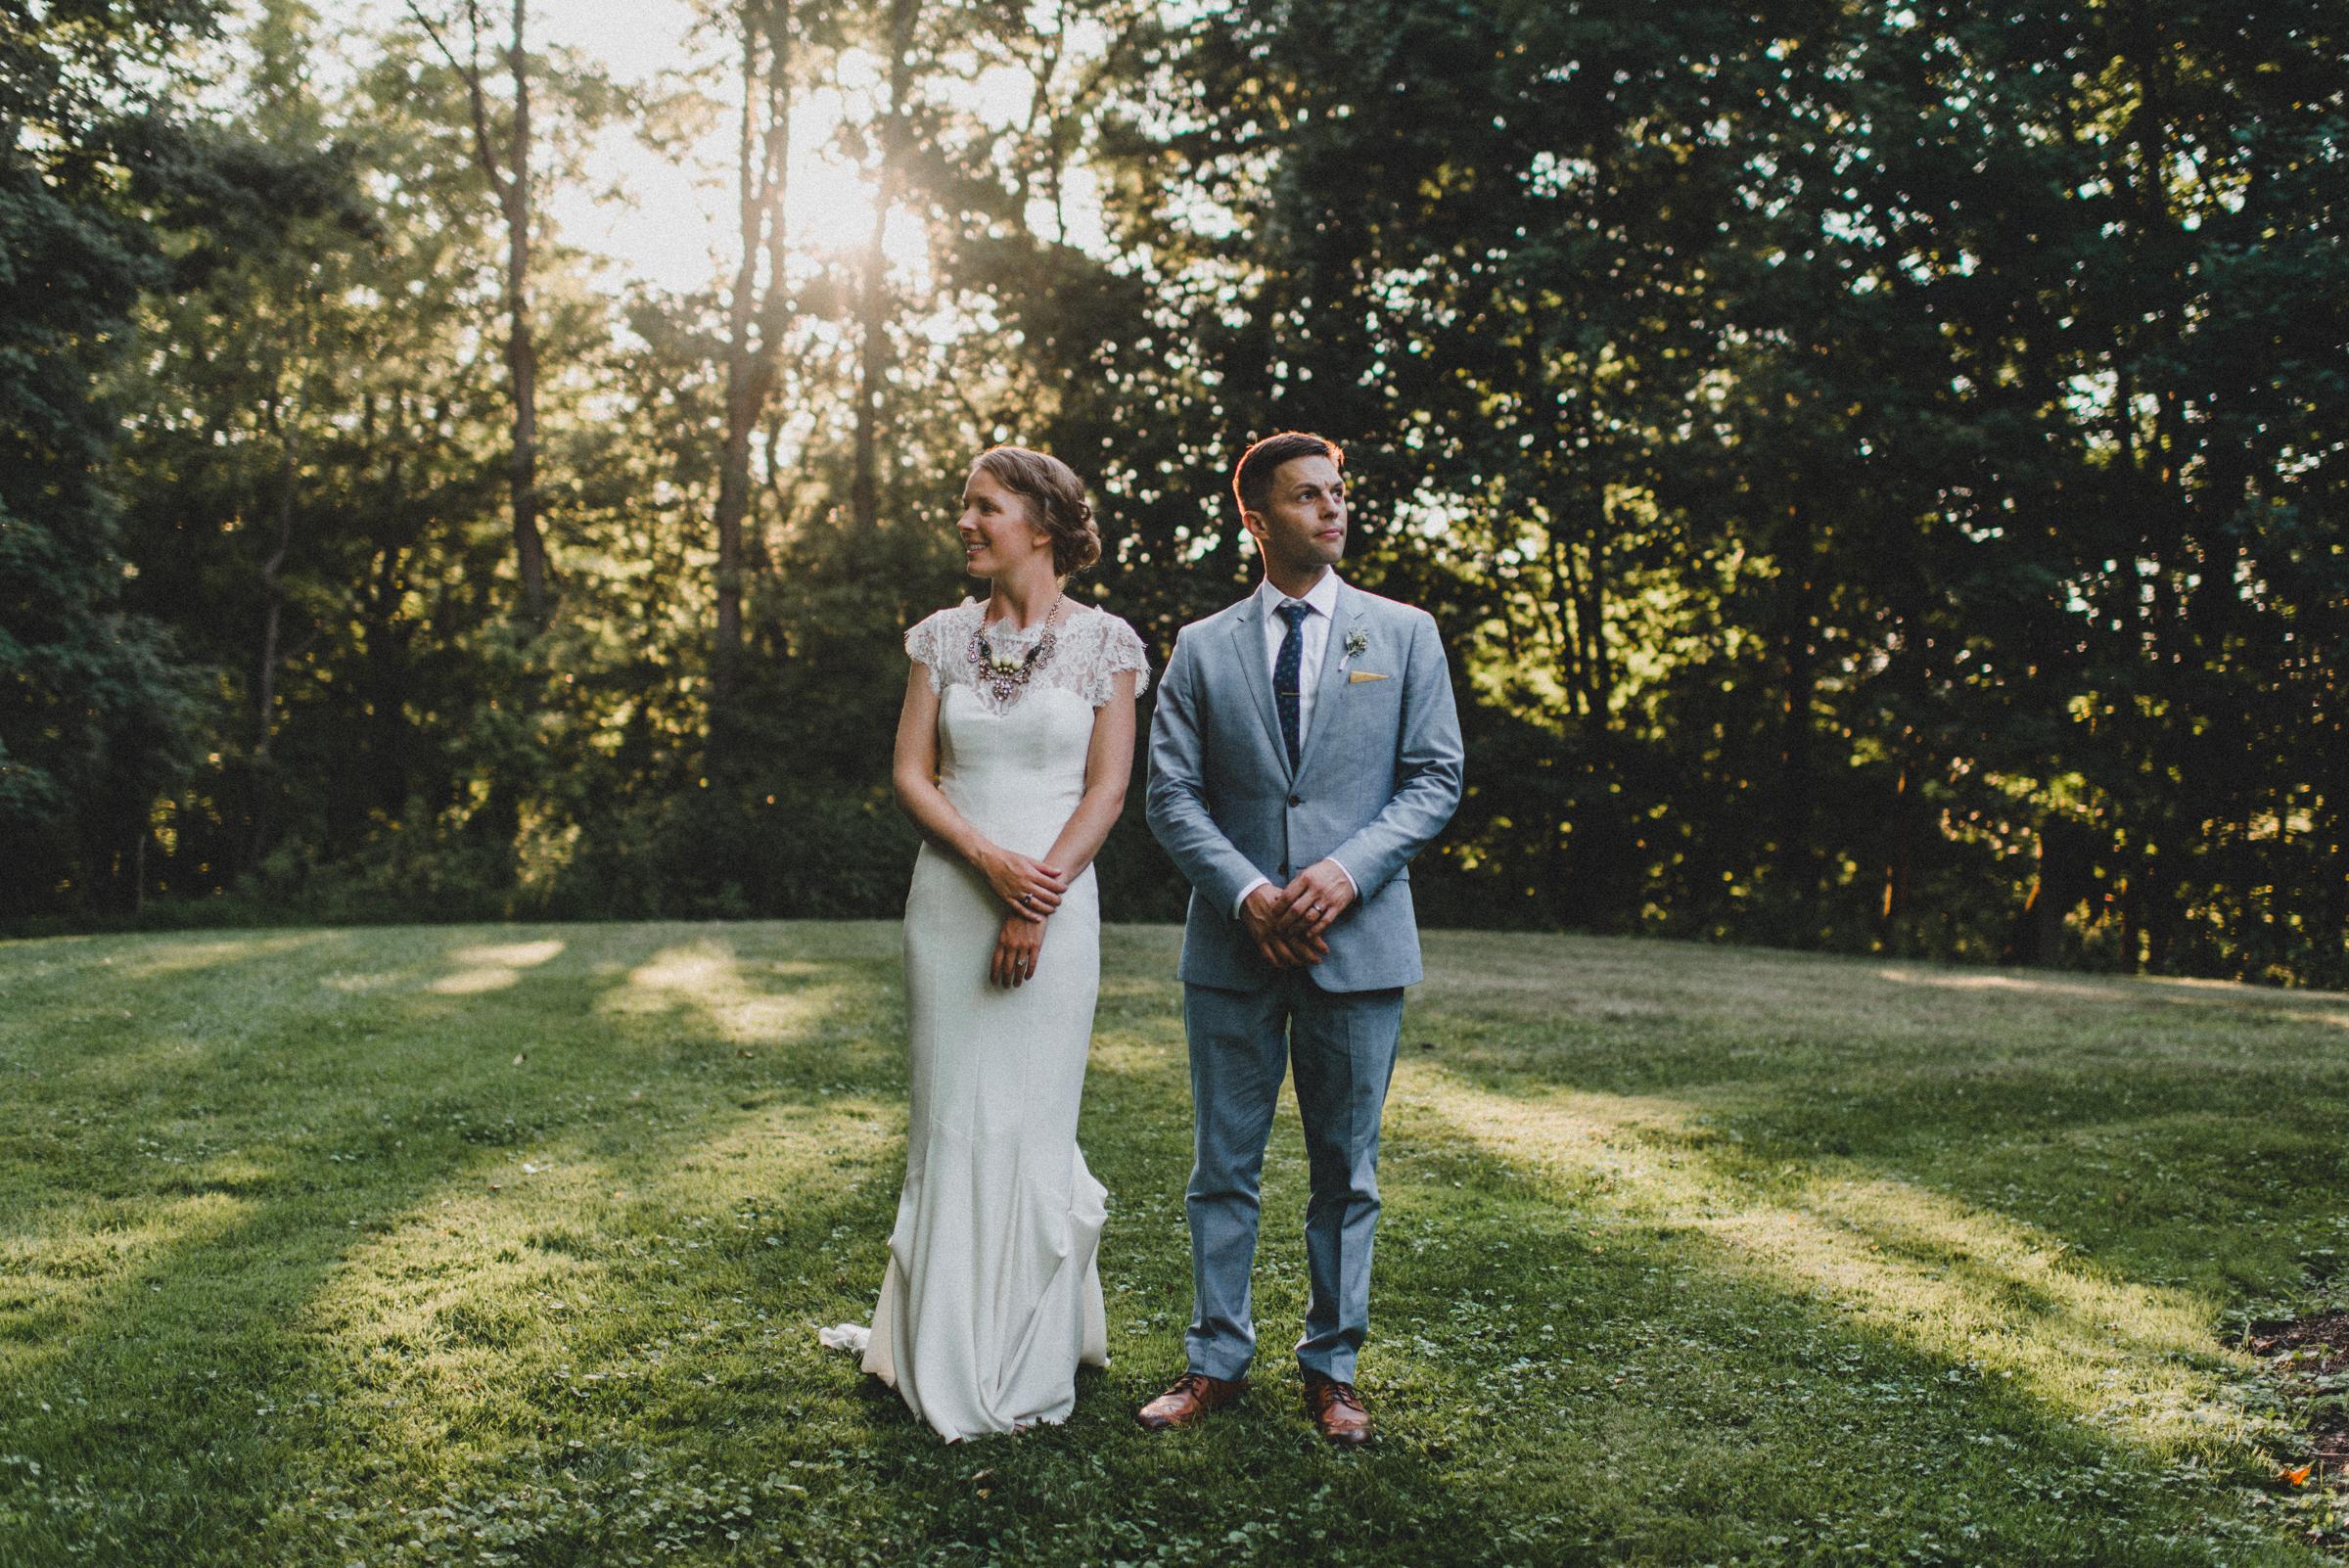 Intimate-Backyard-Farmhouse-Ohio-Wedding-Andi+Ben_Mallory+Justin-Photographers-235.JPG